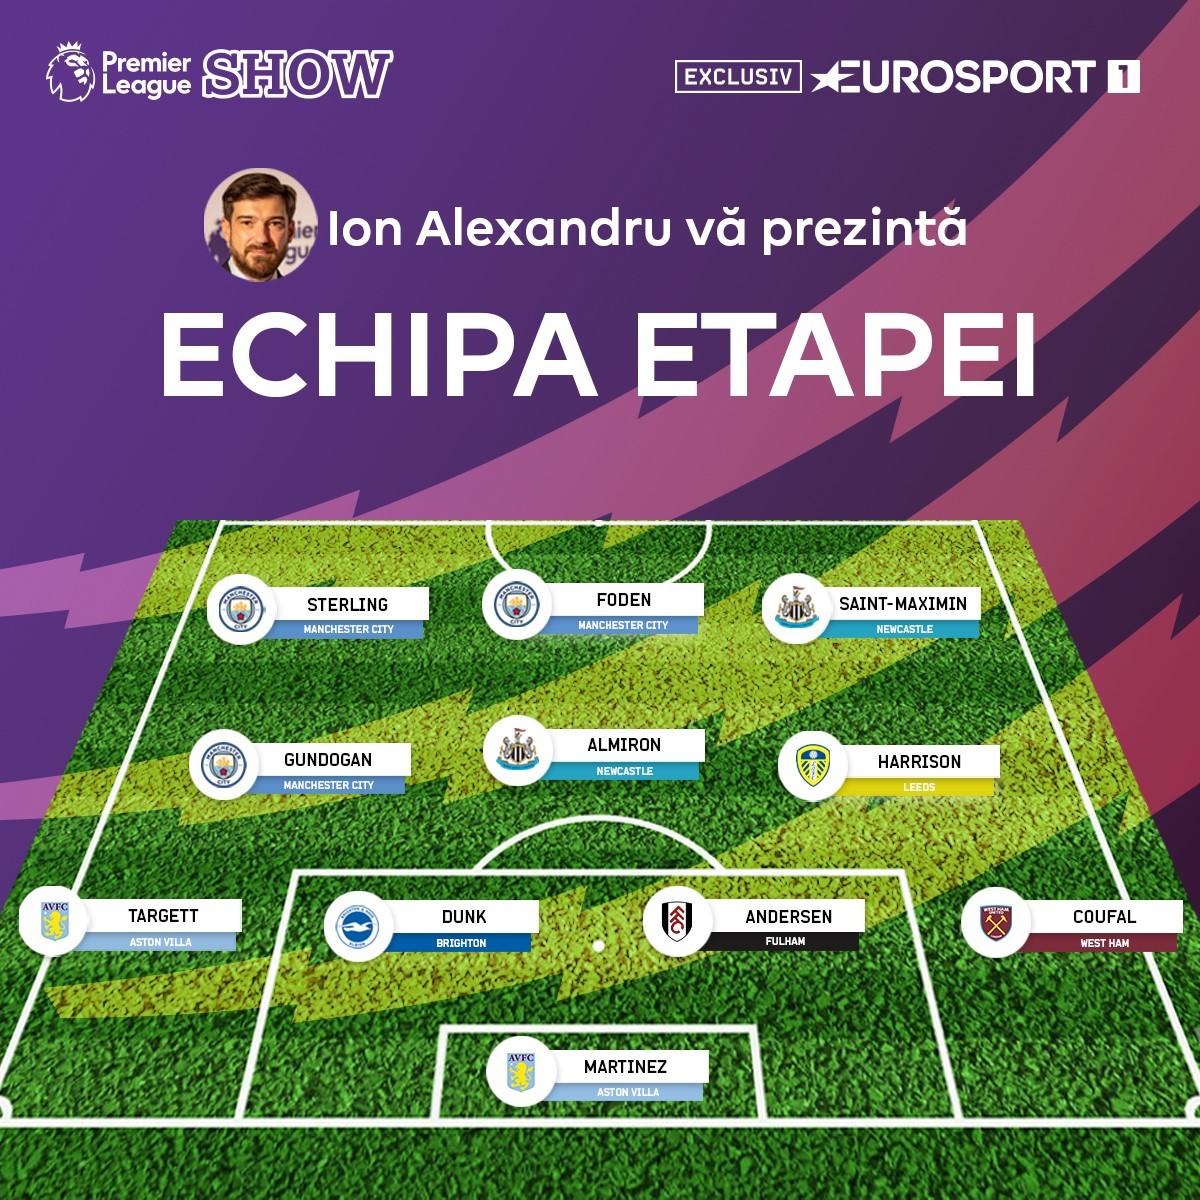 https://i.eurosport.com/2021/02/09/2989302.jpg